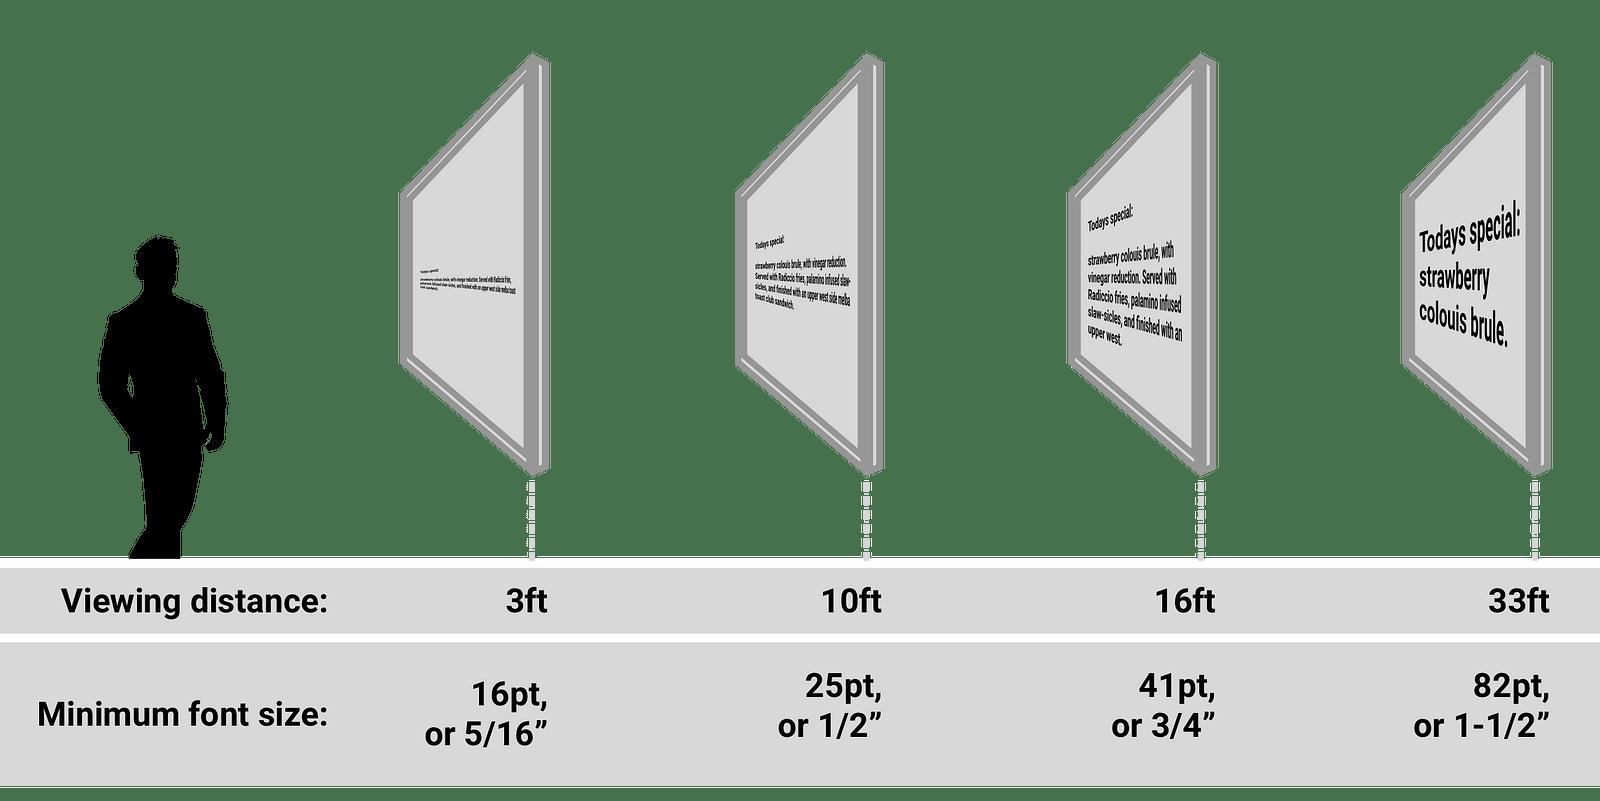 Worksheet How To Read A Tape Measure Test Grass Fedjp Worksheet Study Site